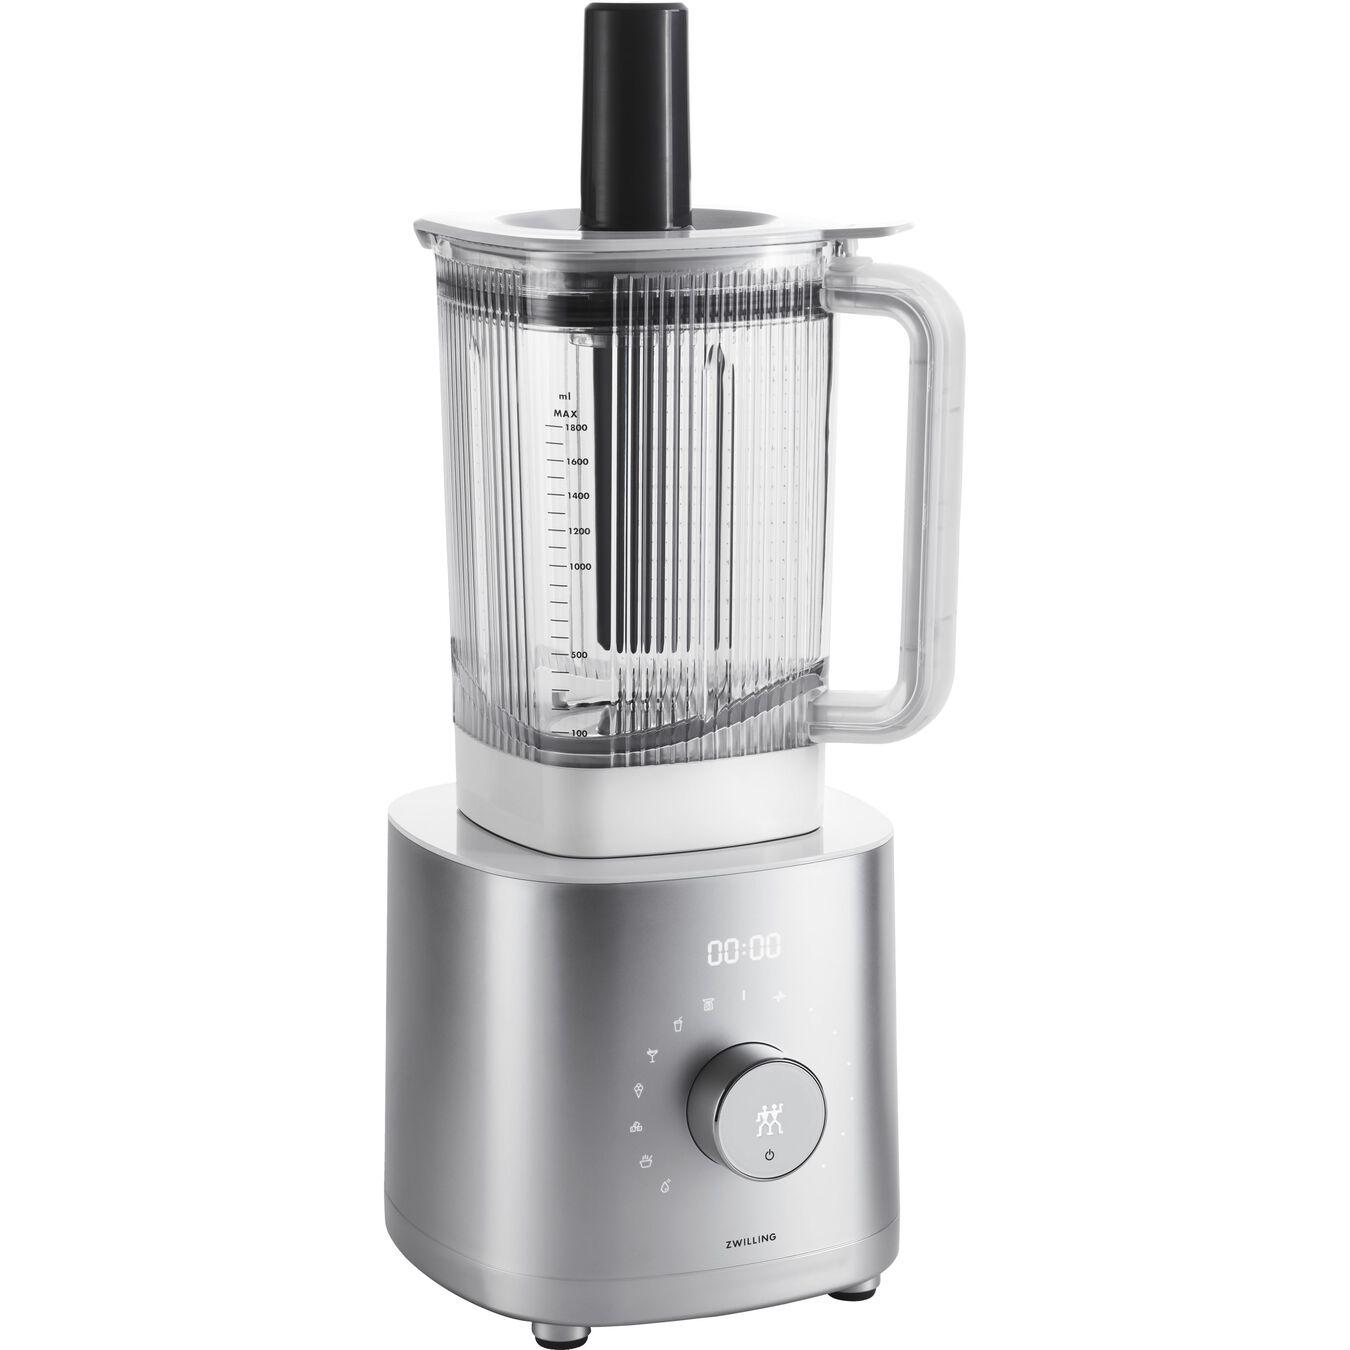 Power Blender Pro, BLDC Motor, Silver,,large 7